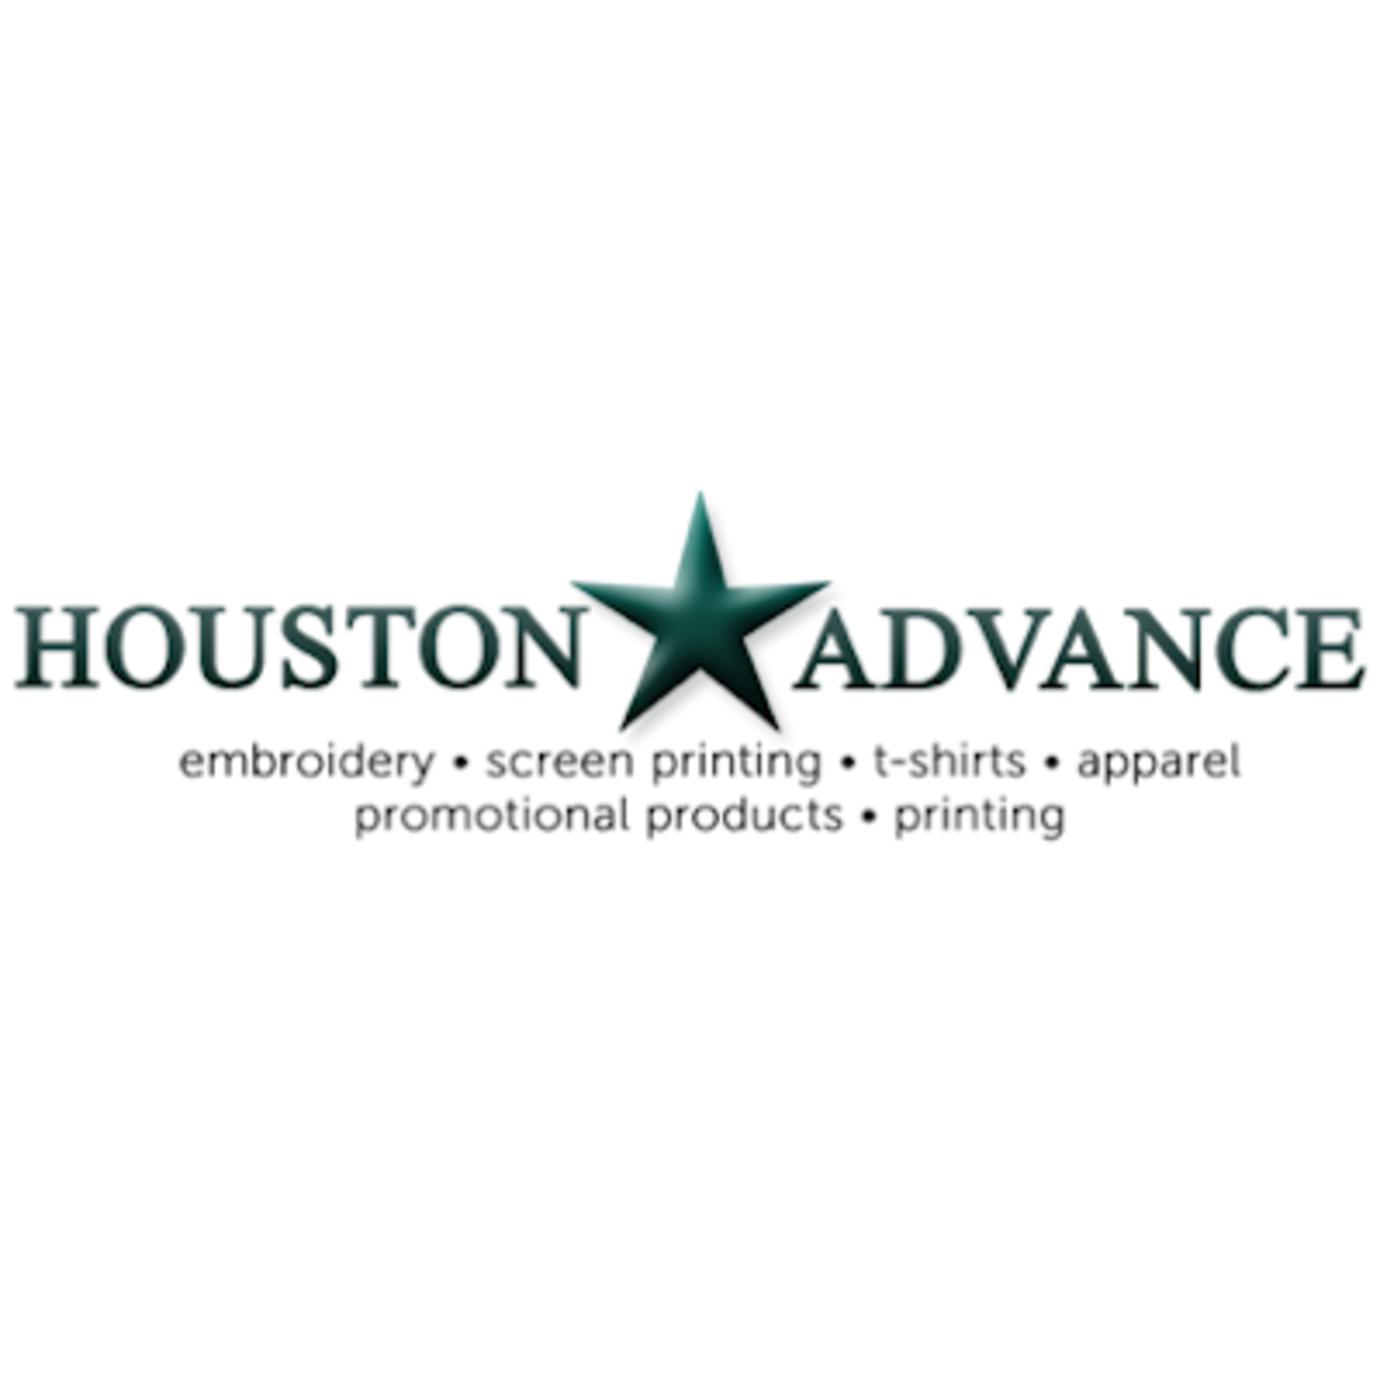 Houston Advance